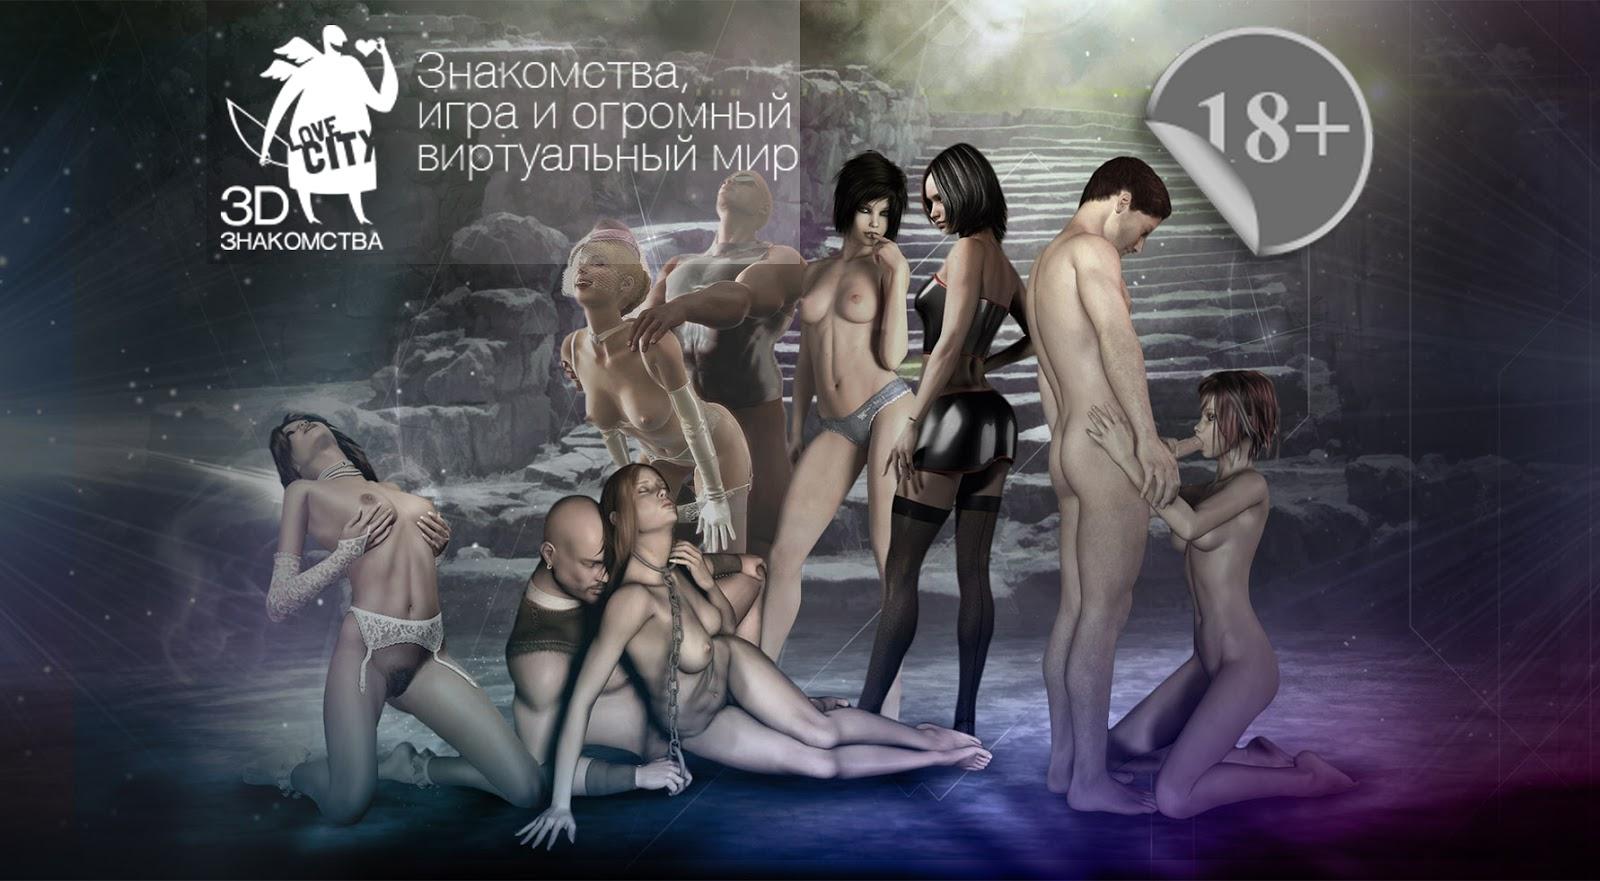 eroticheskie-3d-igri-onlayn